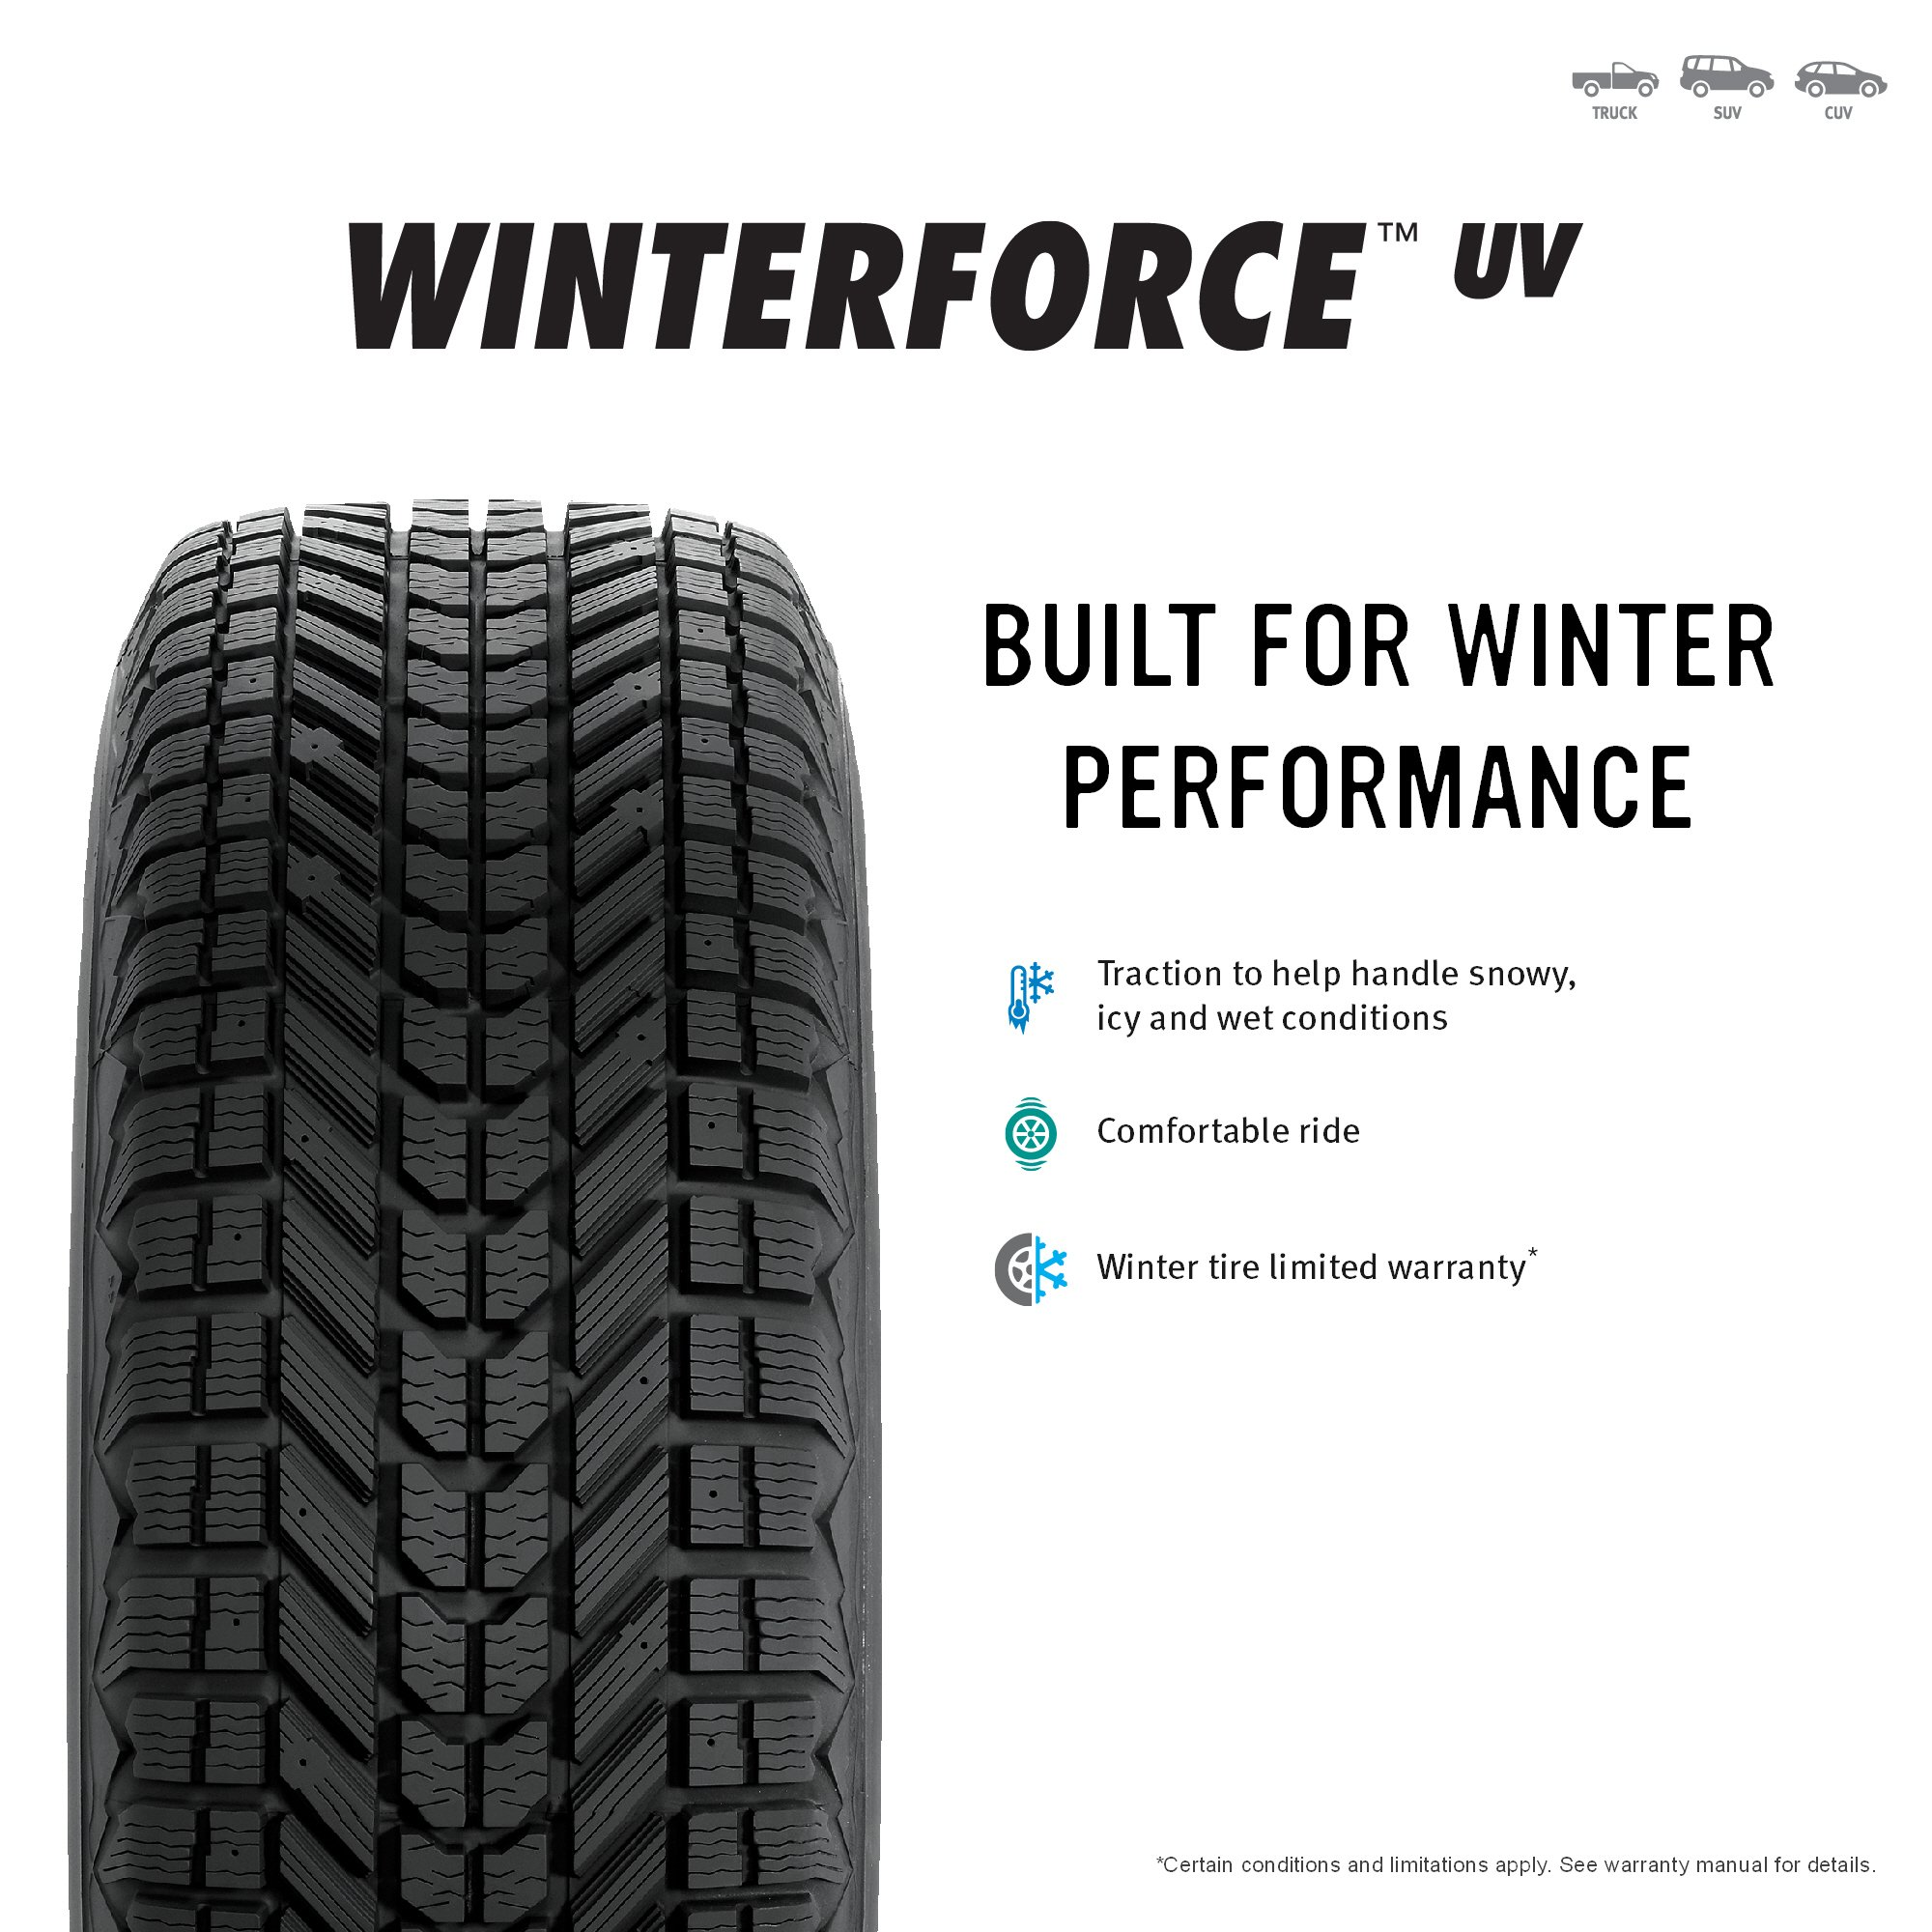 Firestone Winterforce UV Winter Radial Tire - P265/70R17 113S